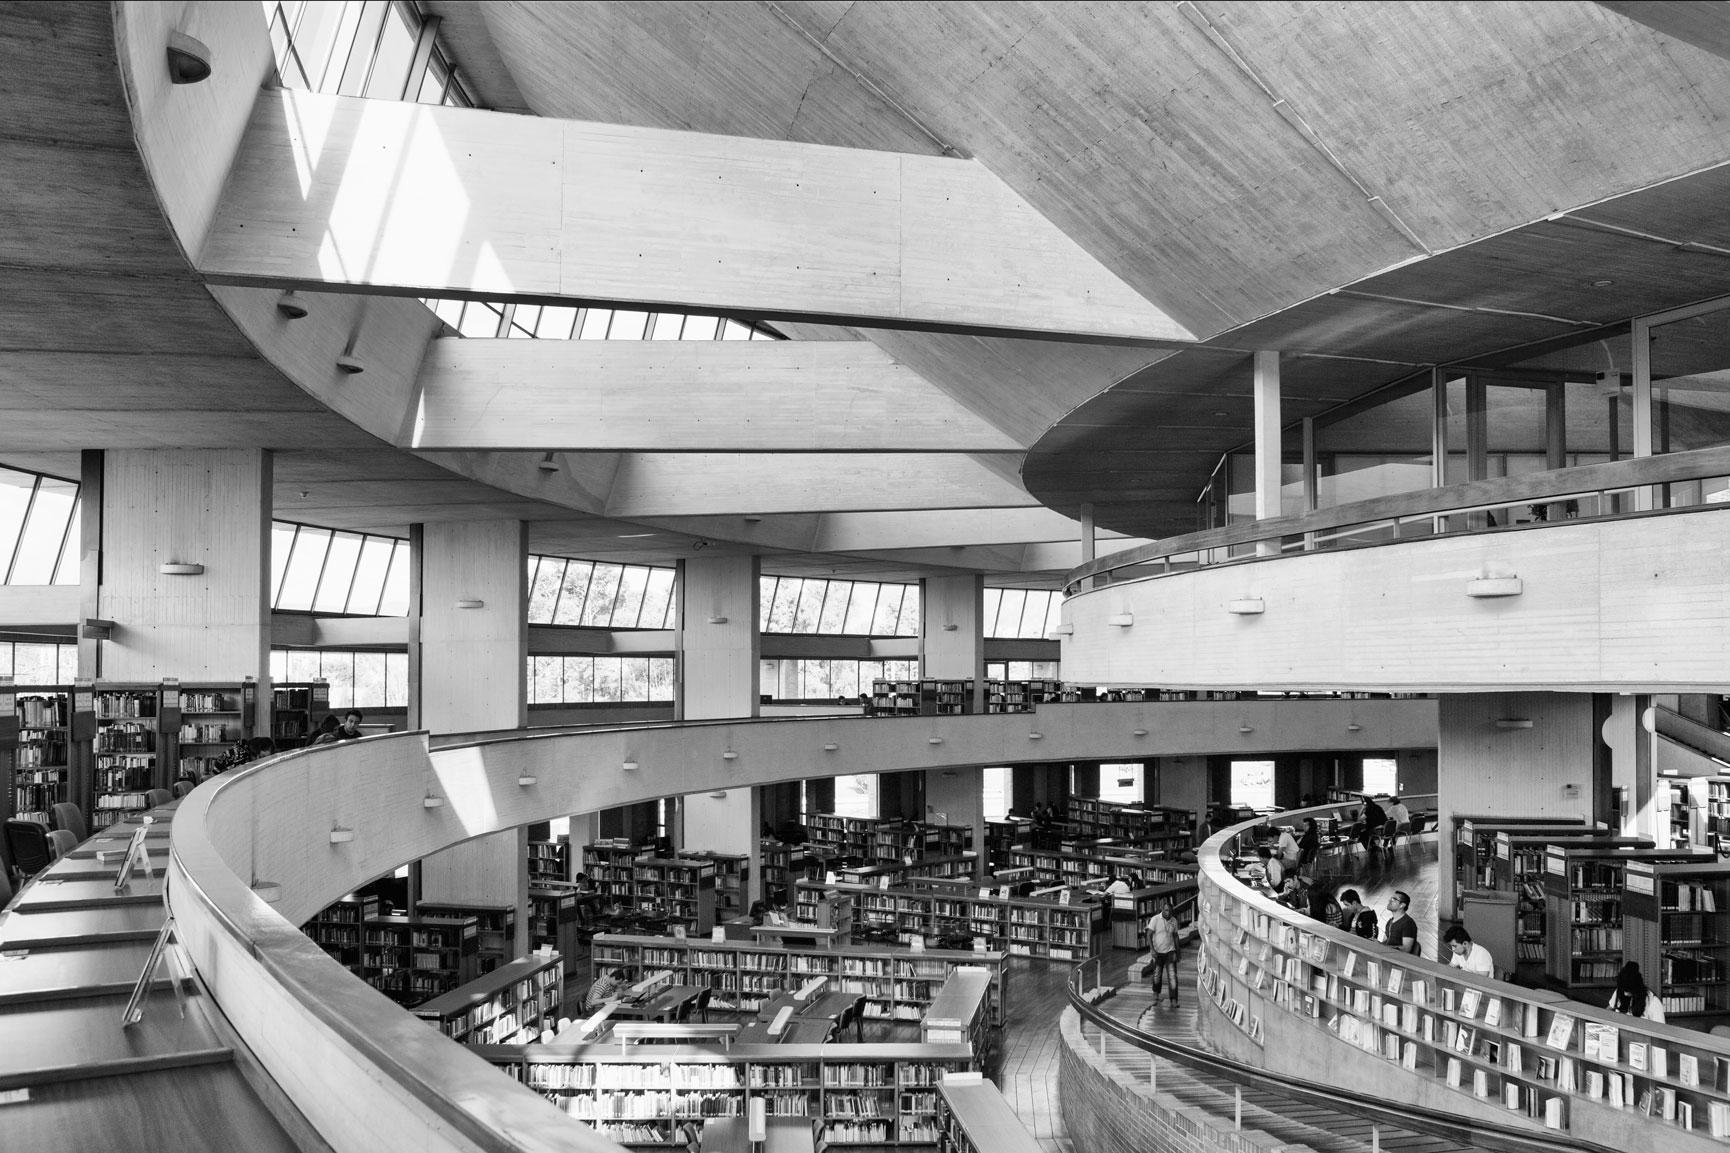 07-simonbosch photography-simon-bosch-architectuur-architecture-bogota-colombia-ArchDaily-Biblioteca Publica Virgilio Barco